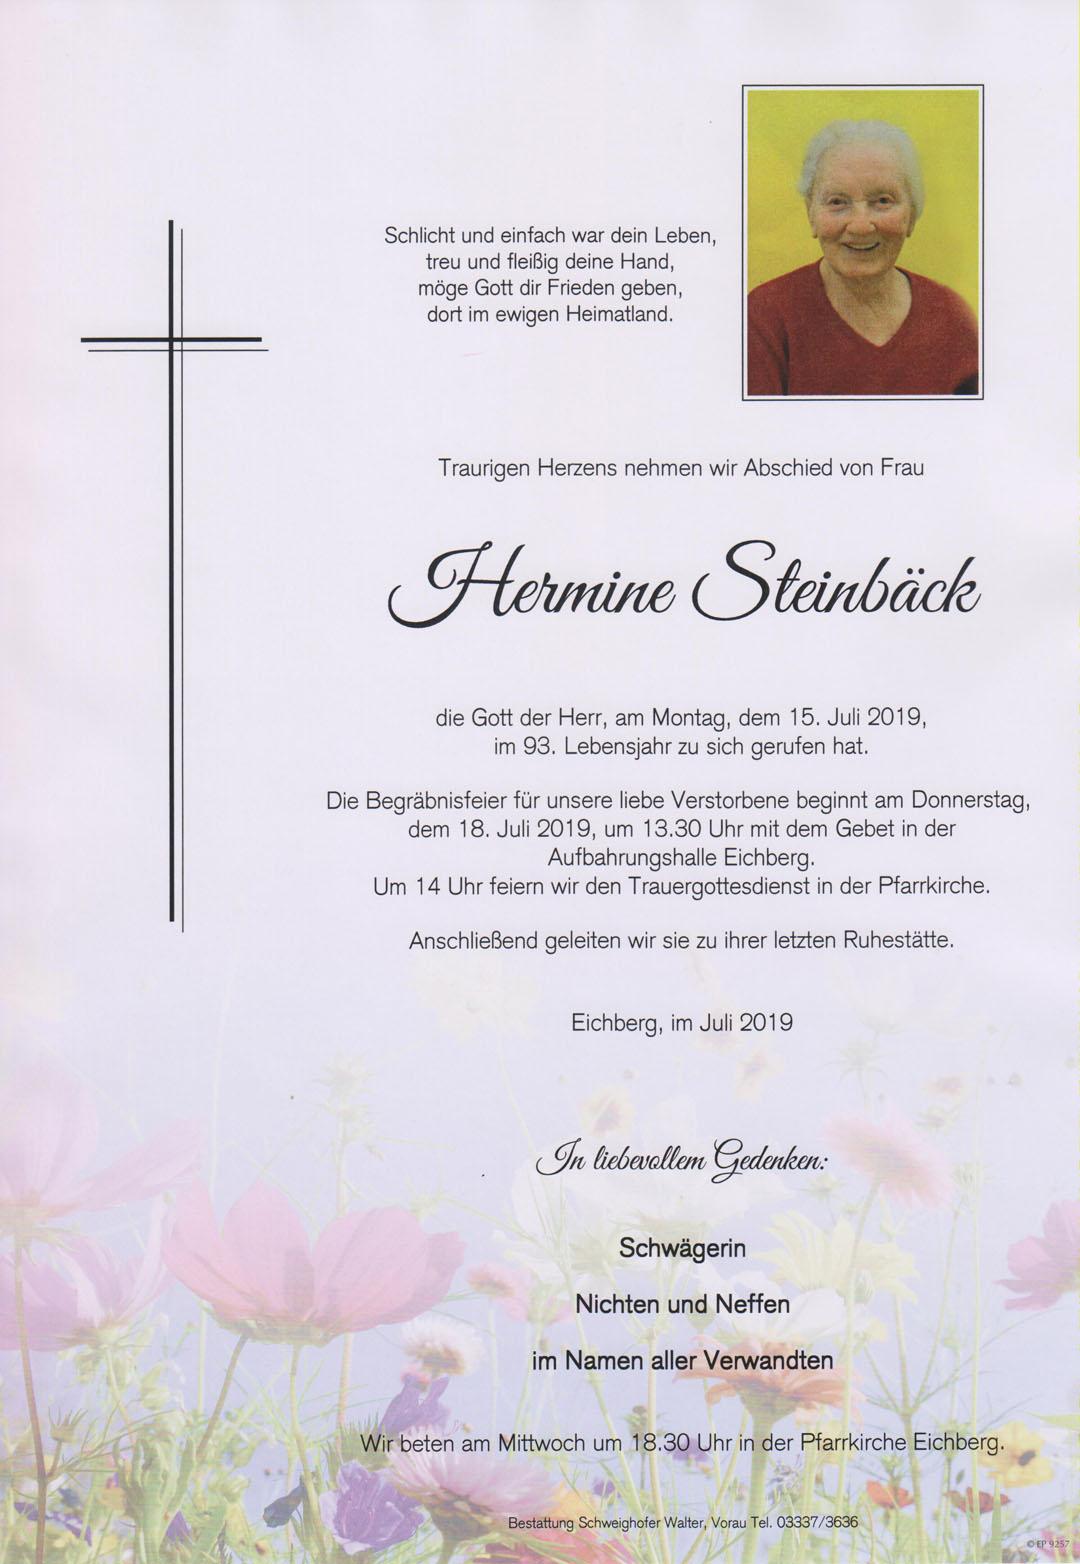 Hermine Steinbäck